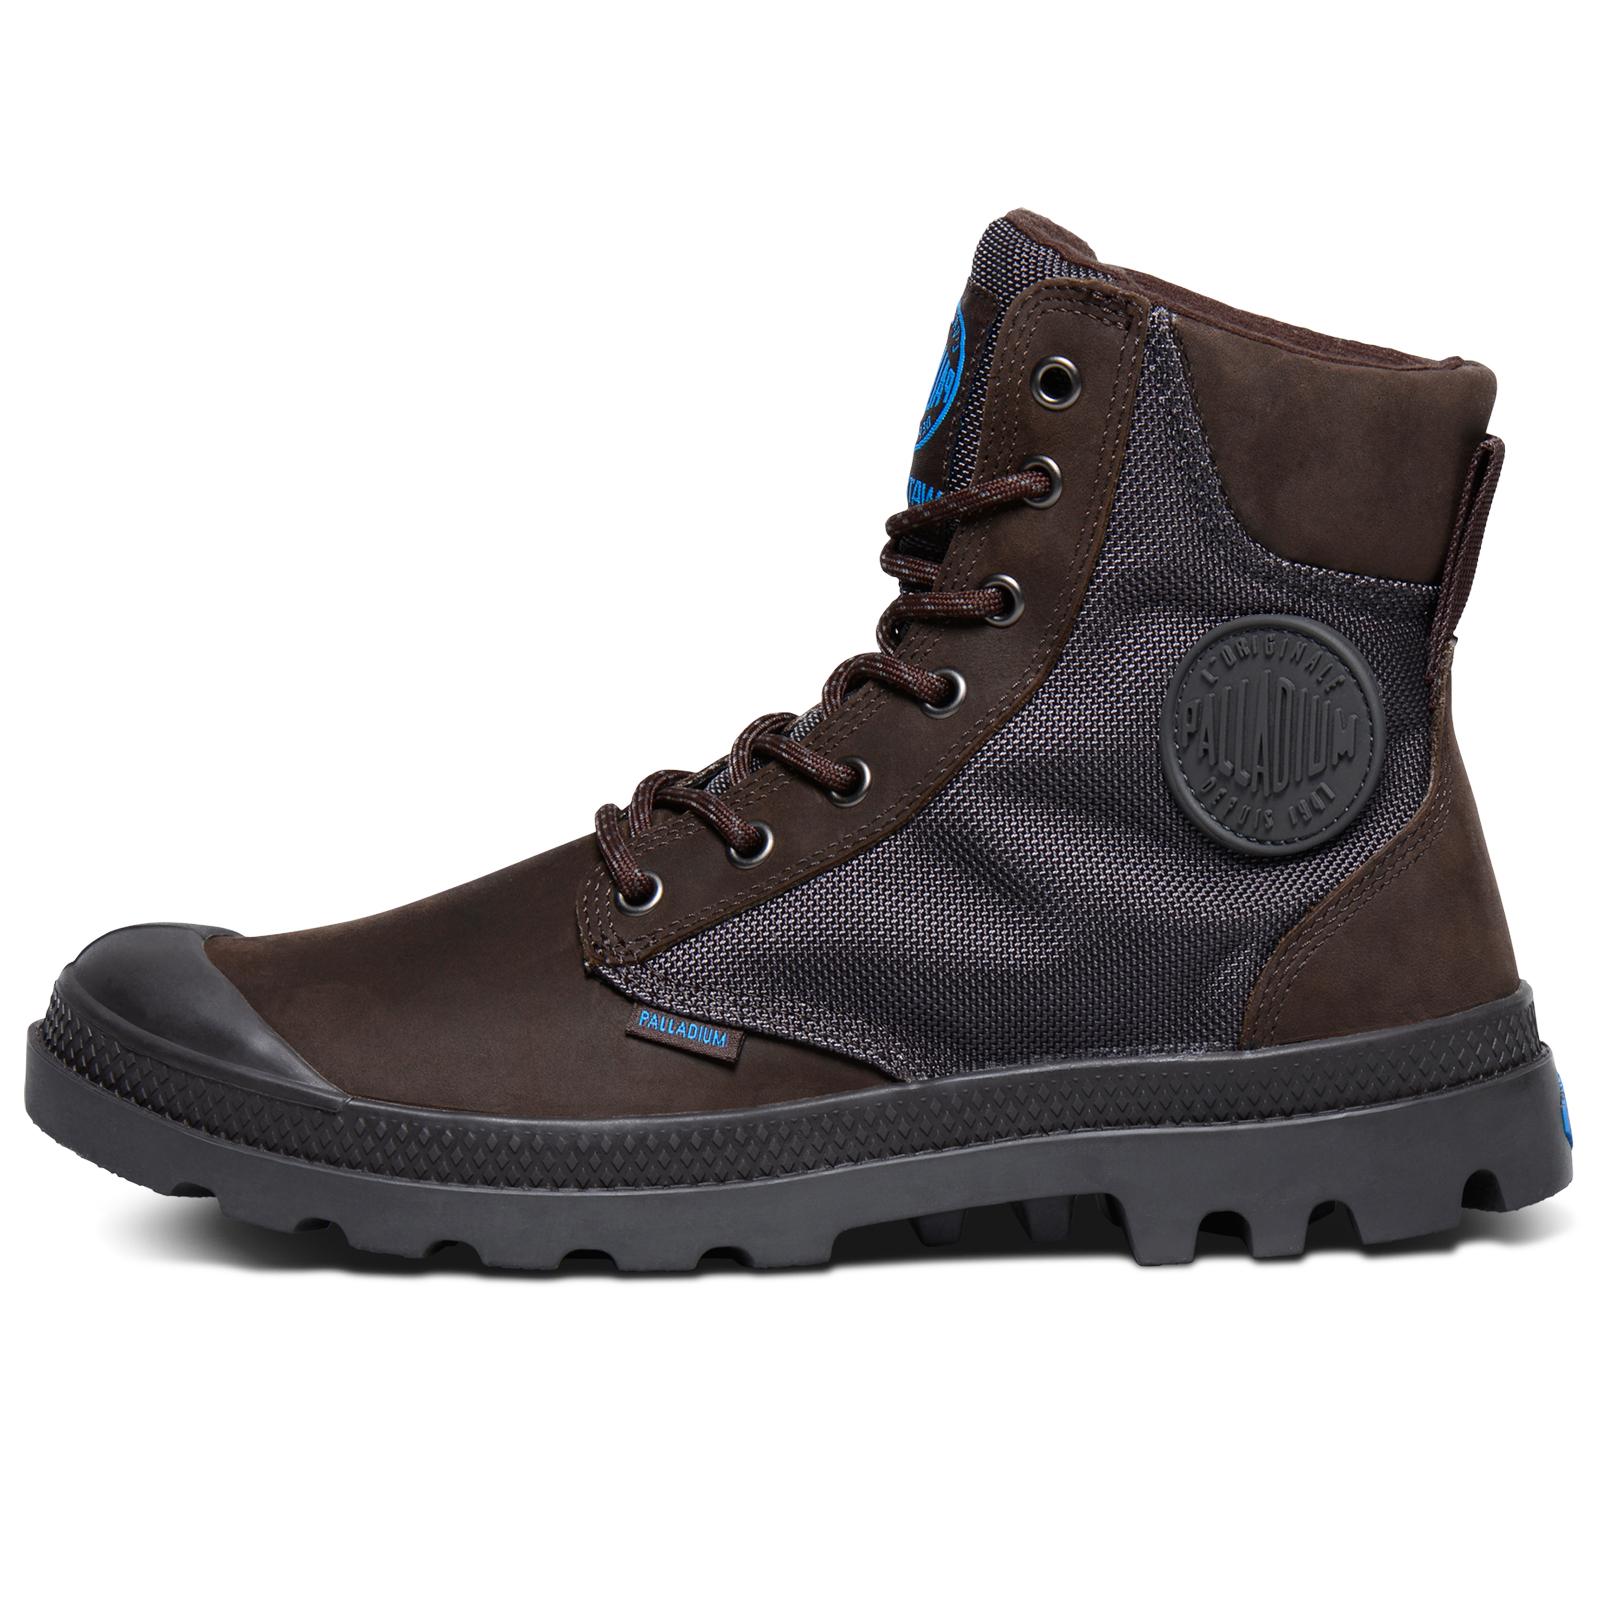 Palladium-Pampa-Sport-Mens-Shoes-Womens-Waterproof-Walking-High-Top-Ankle-Boots thumbnail 23